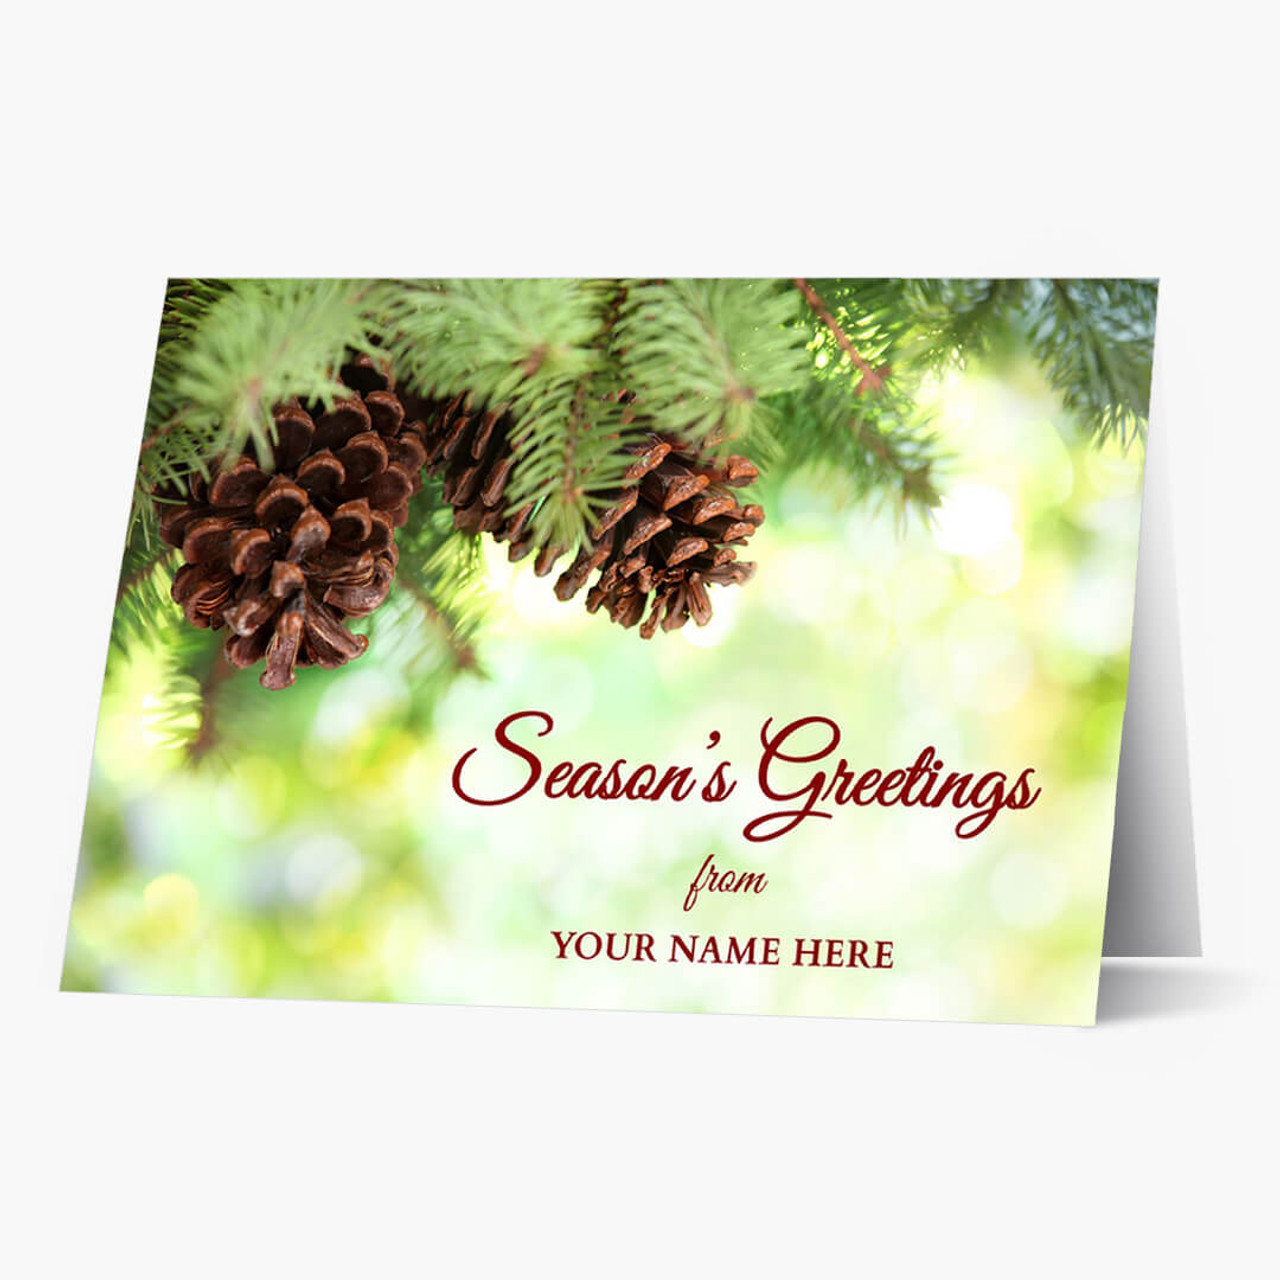 Pine Cone Greetings Christmas Card